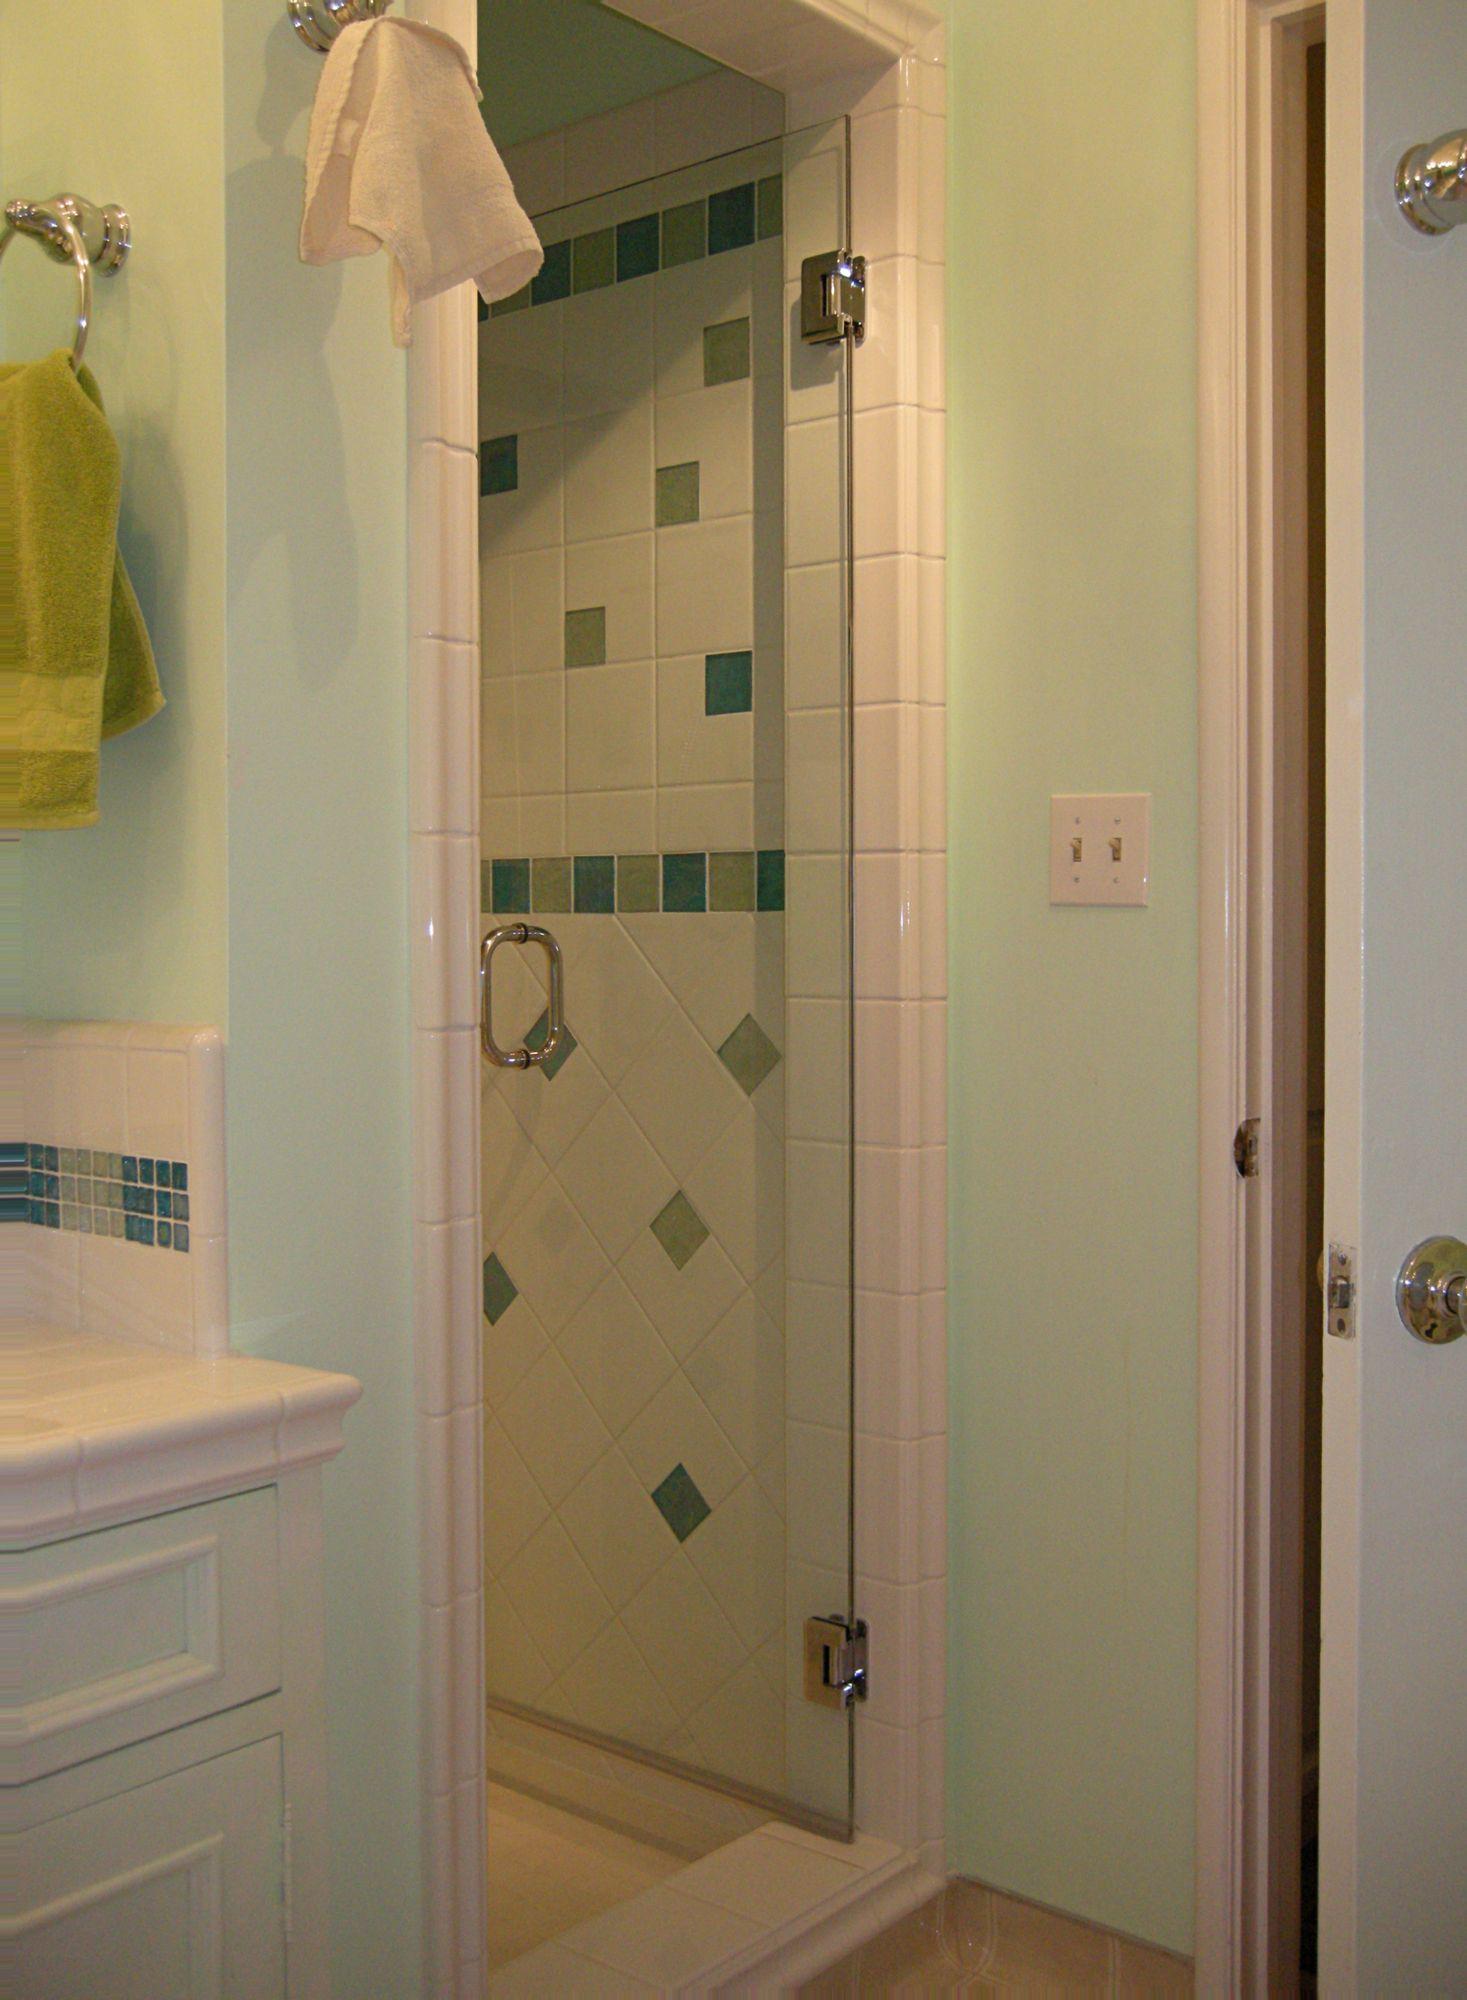 Vintage Tile Bathroom Remodel By Ceramic Finishes Los Angeles Ca